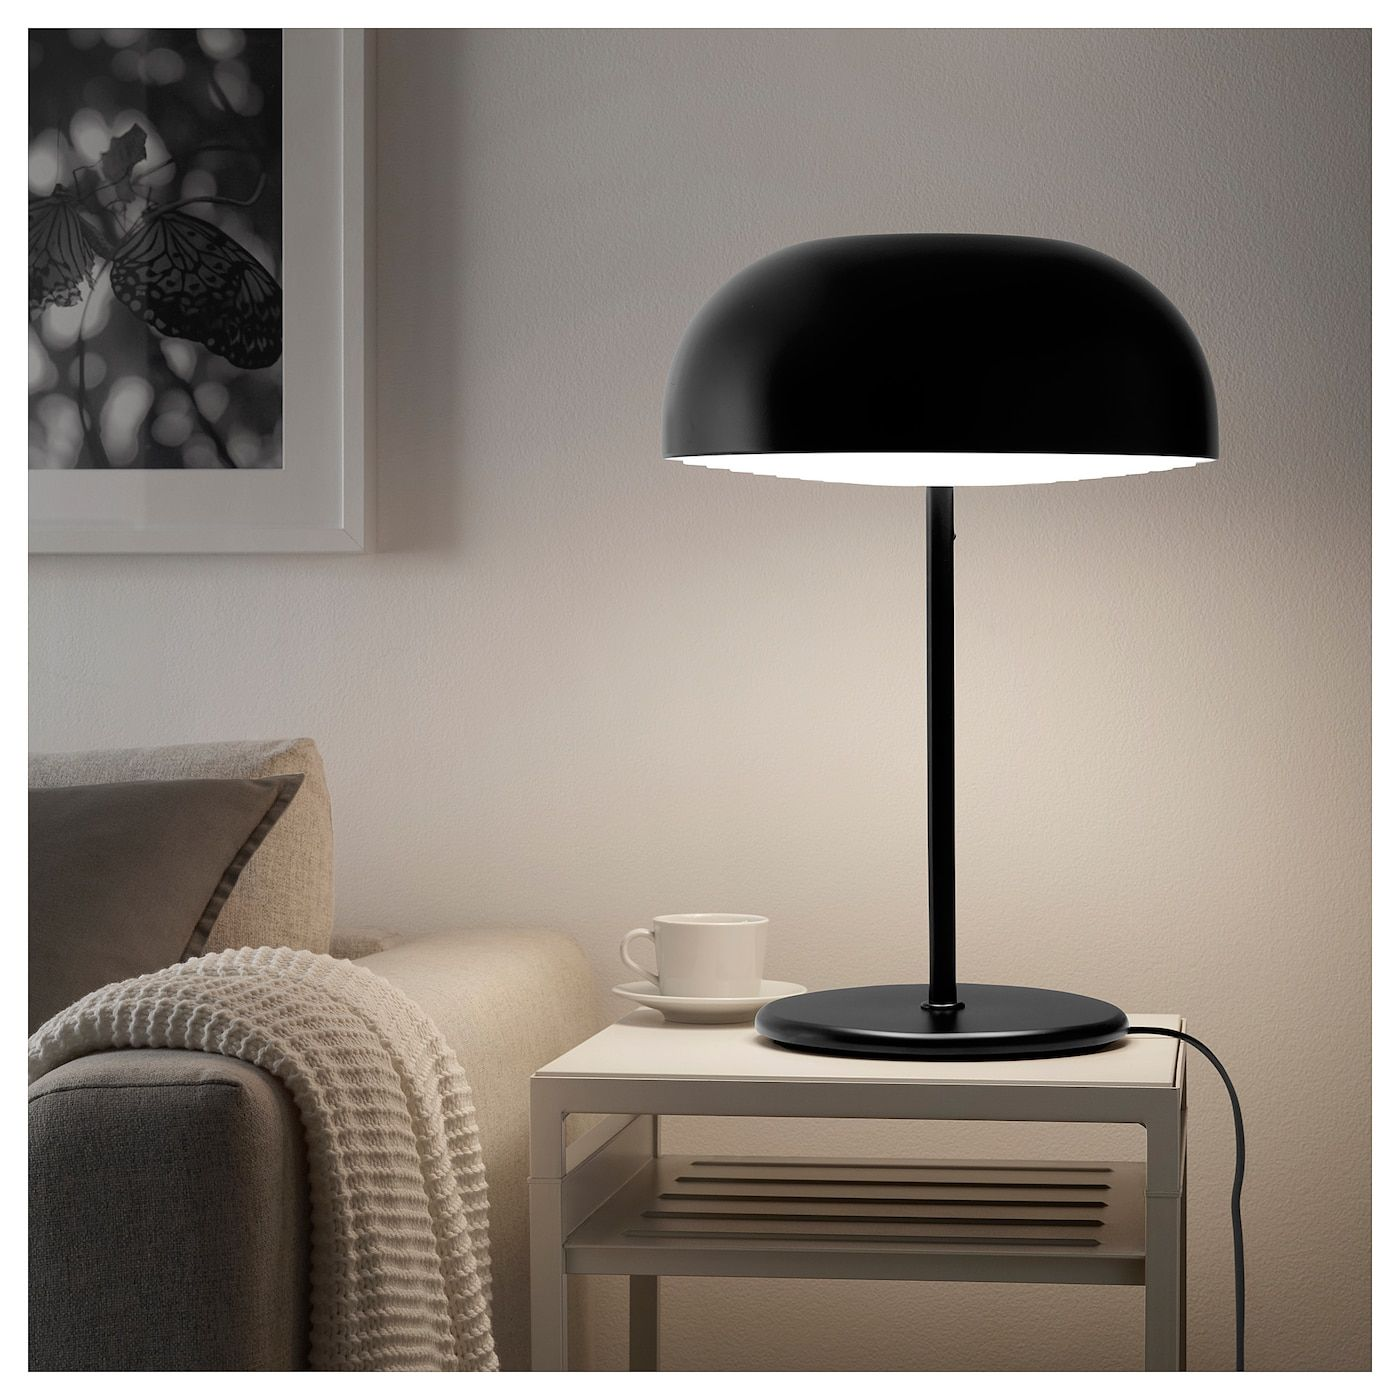 Nymane Bordslampa Antracit Ikea Table Lamp Lamp Ikea